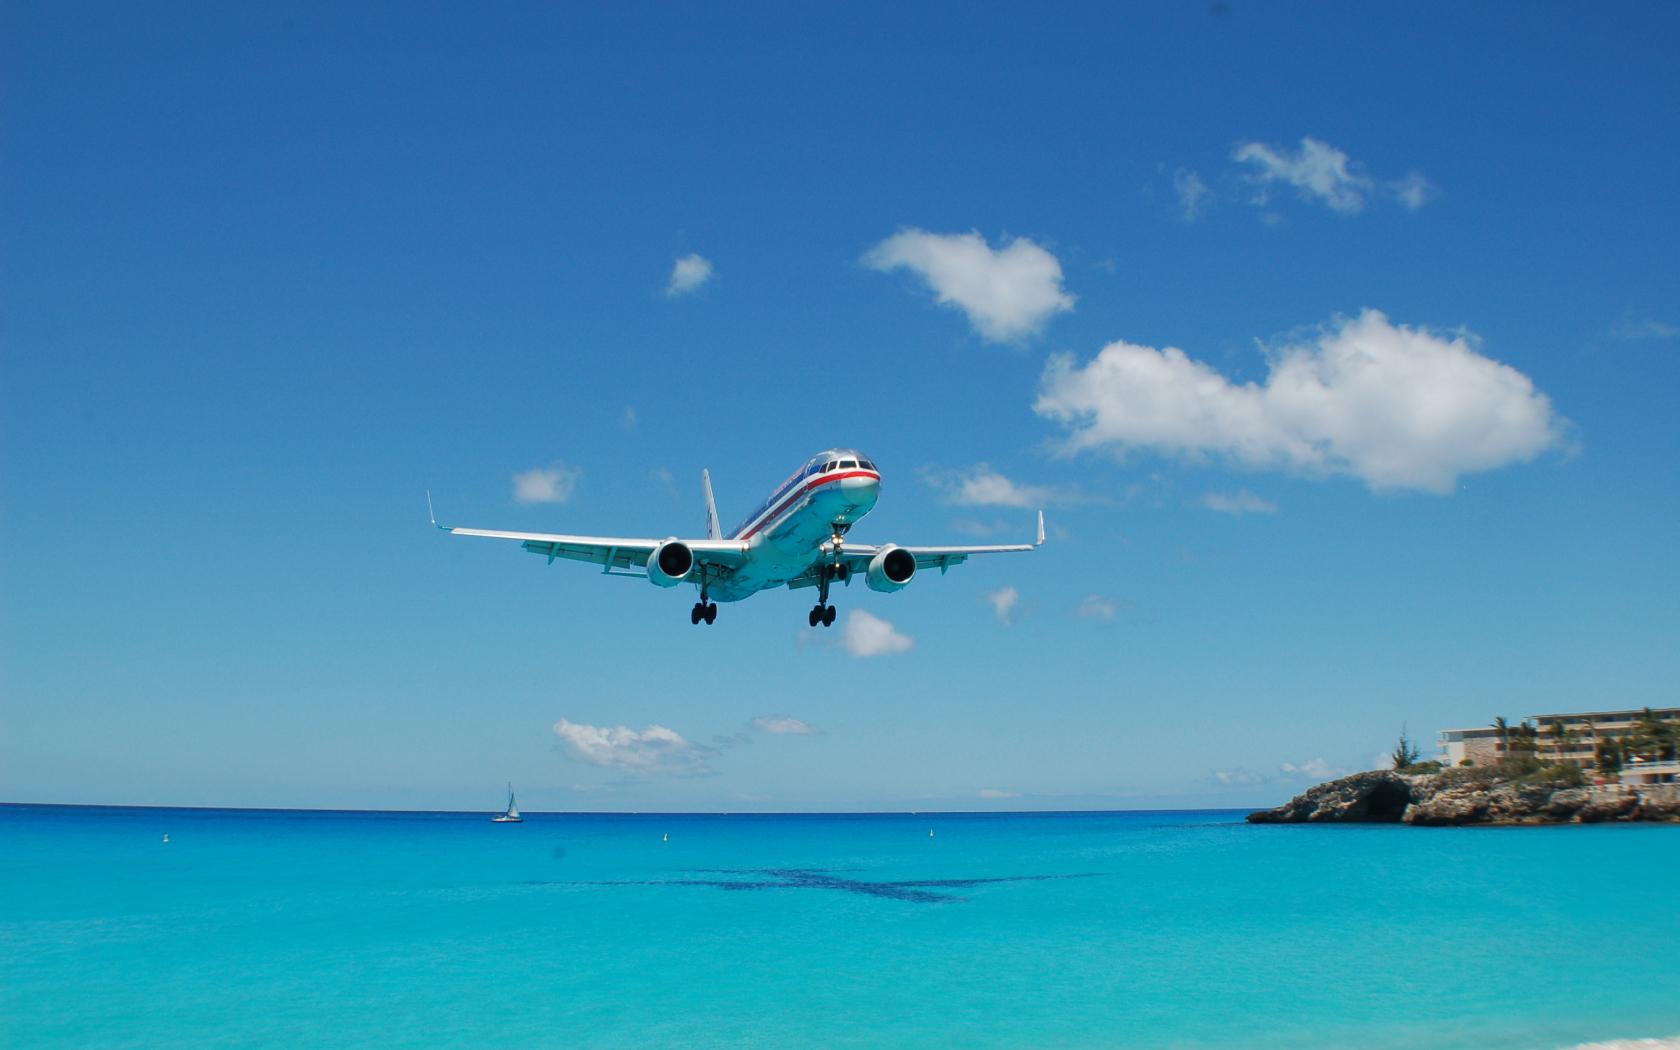 Free download Airplane HD Wallpaper